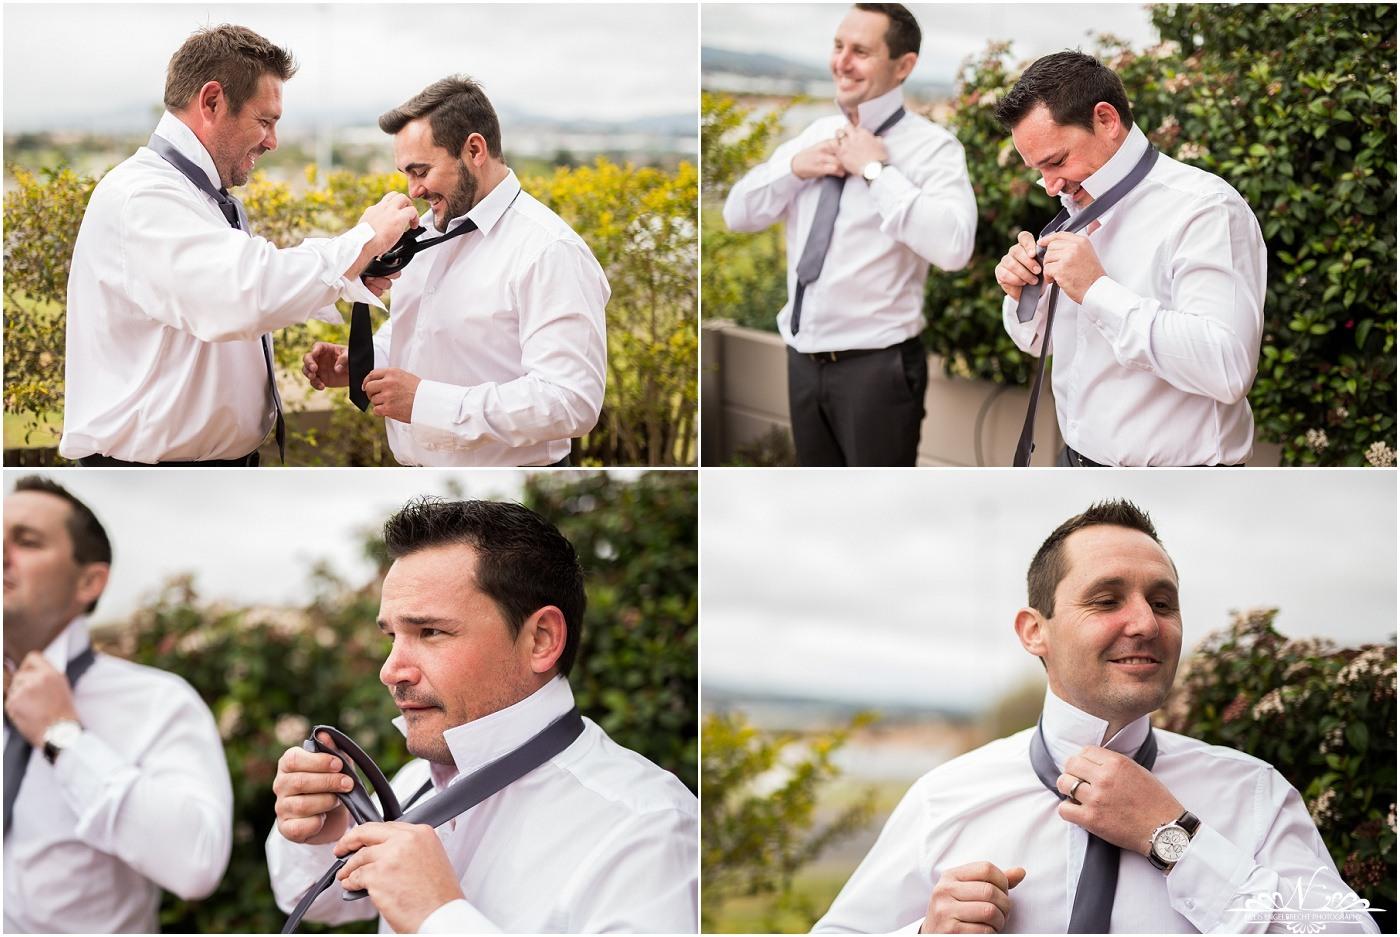 Eensgezind-Wedding-Photos-Nelis-Engelbrecht-Photography-011